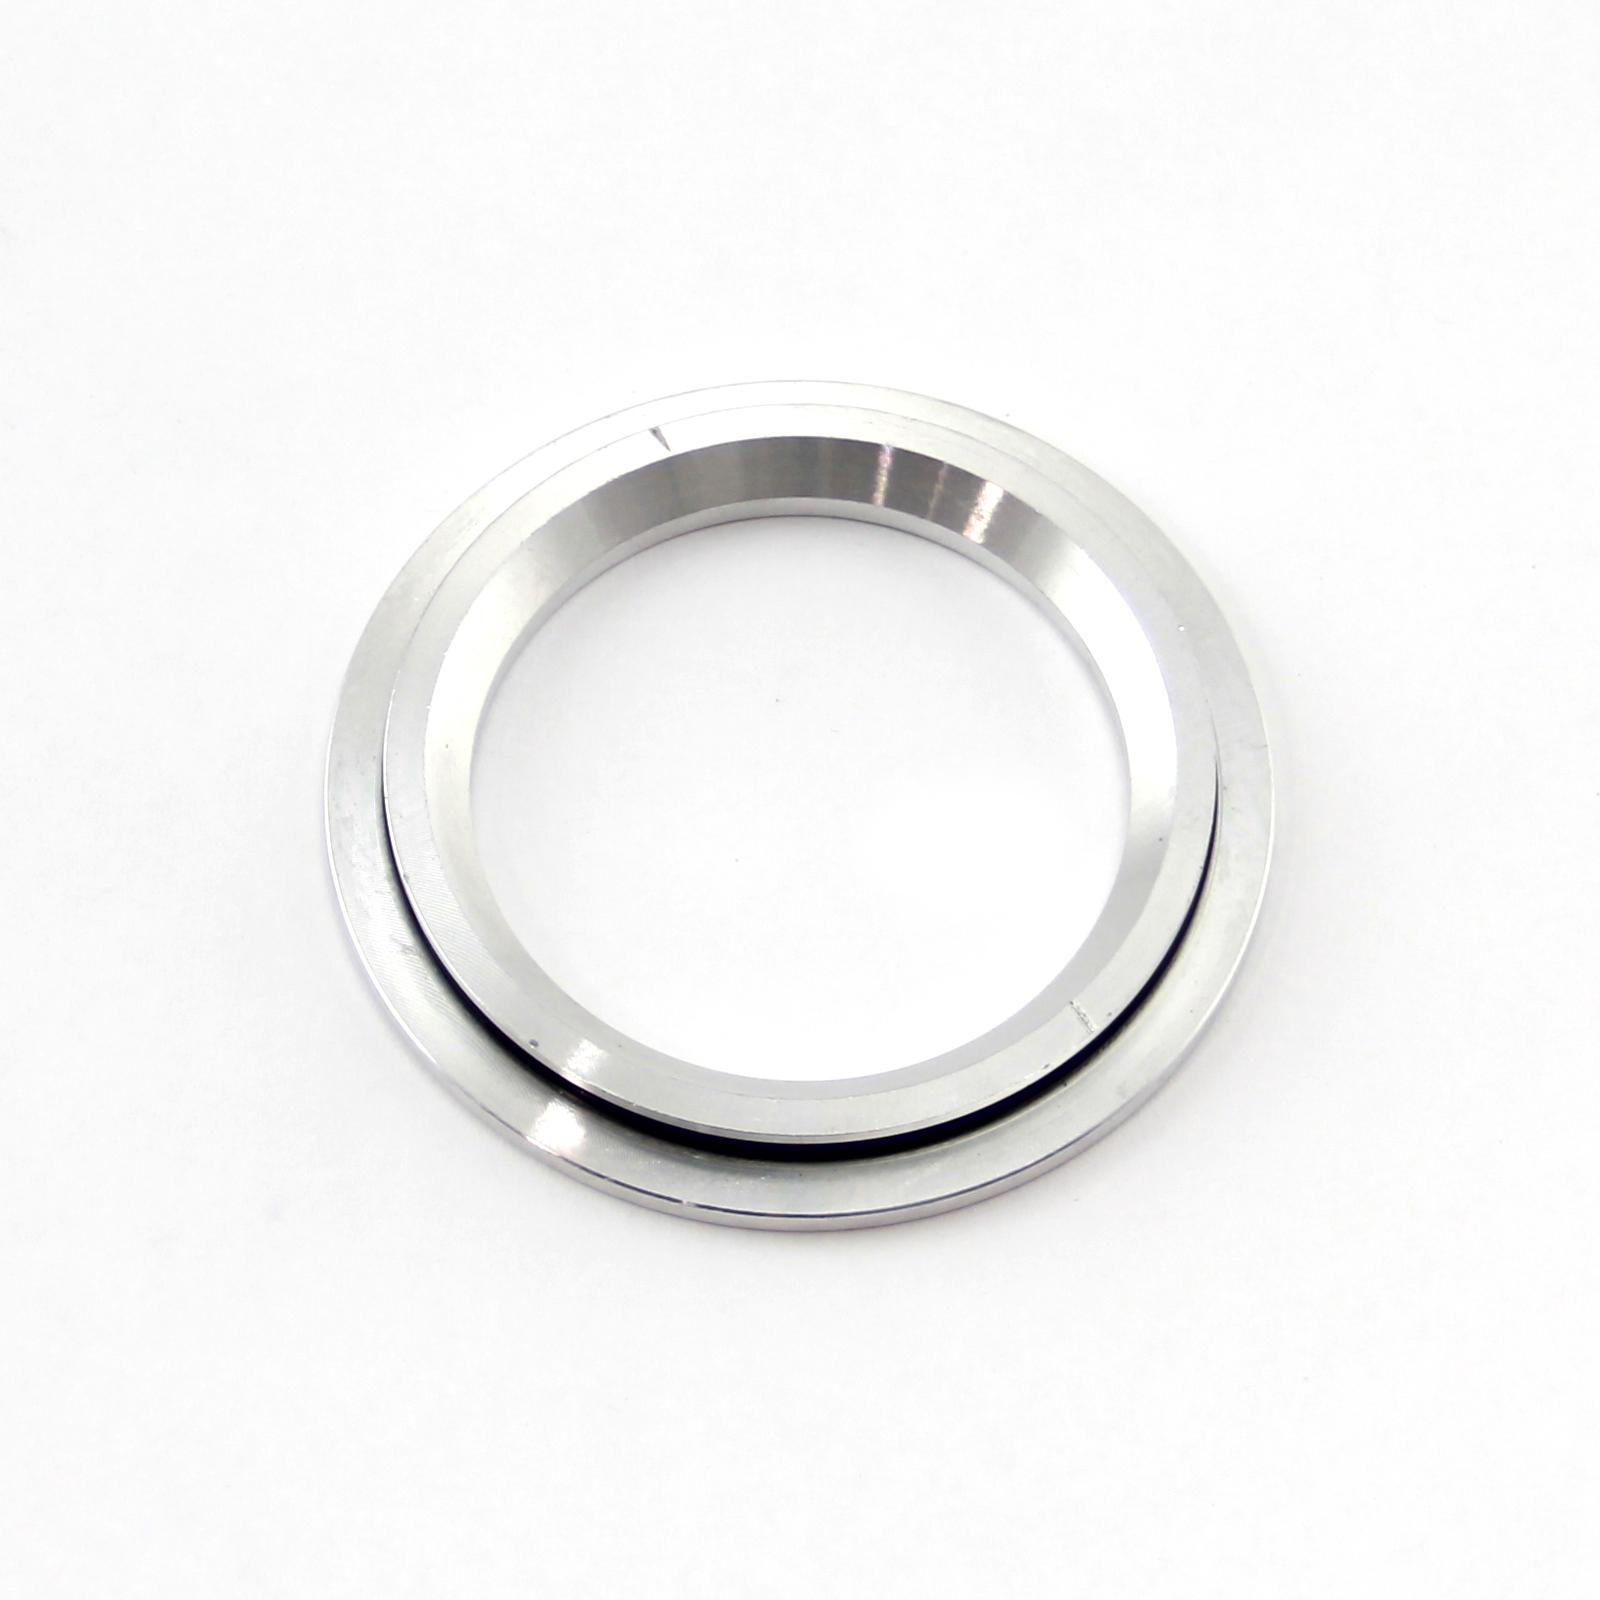 Chevy V8 Billet Aluminum Oil Filter Ring Adapter Only